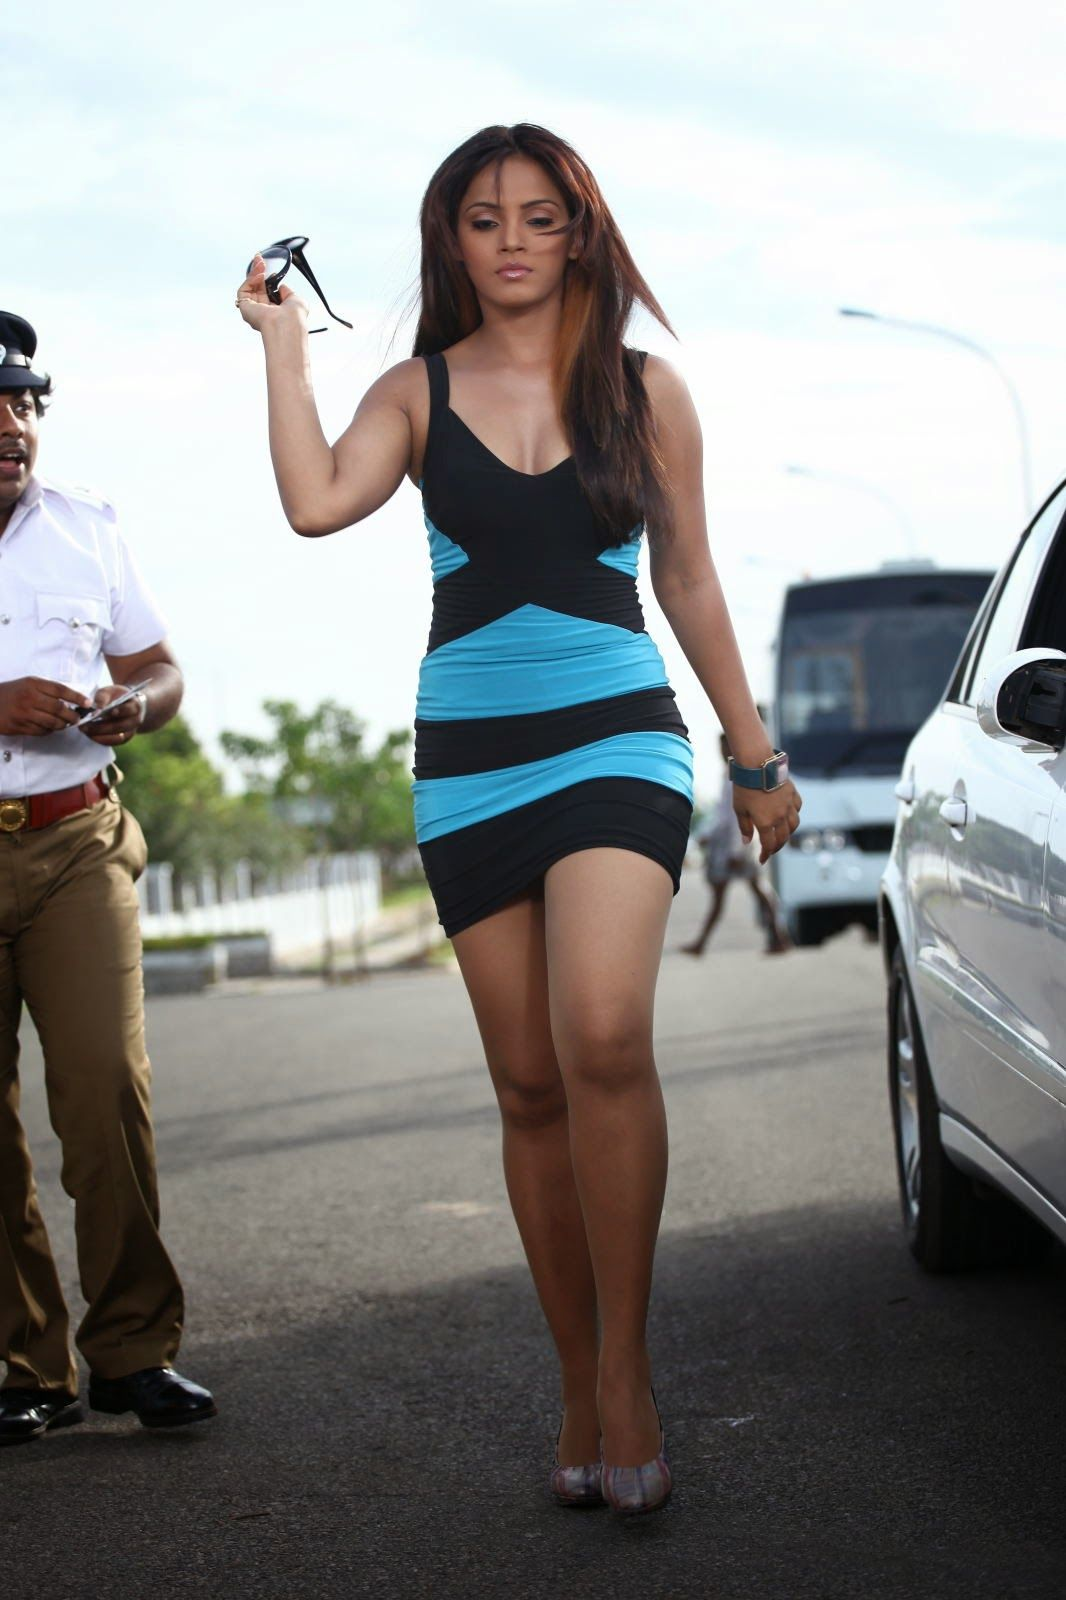 frye shoes for women melanie chandra bikini